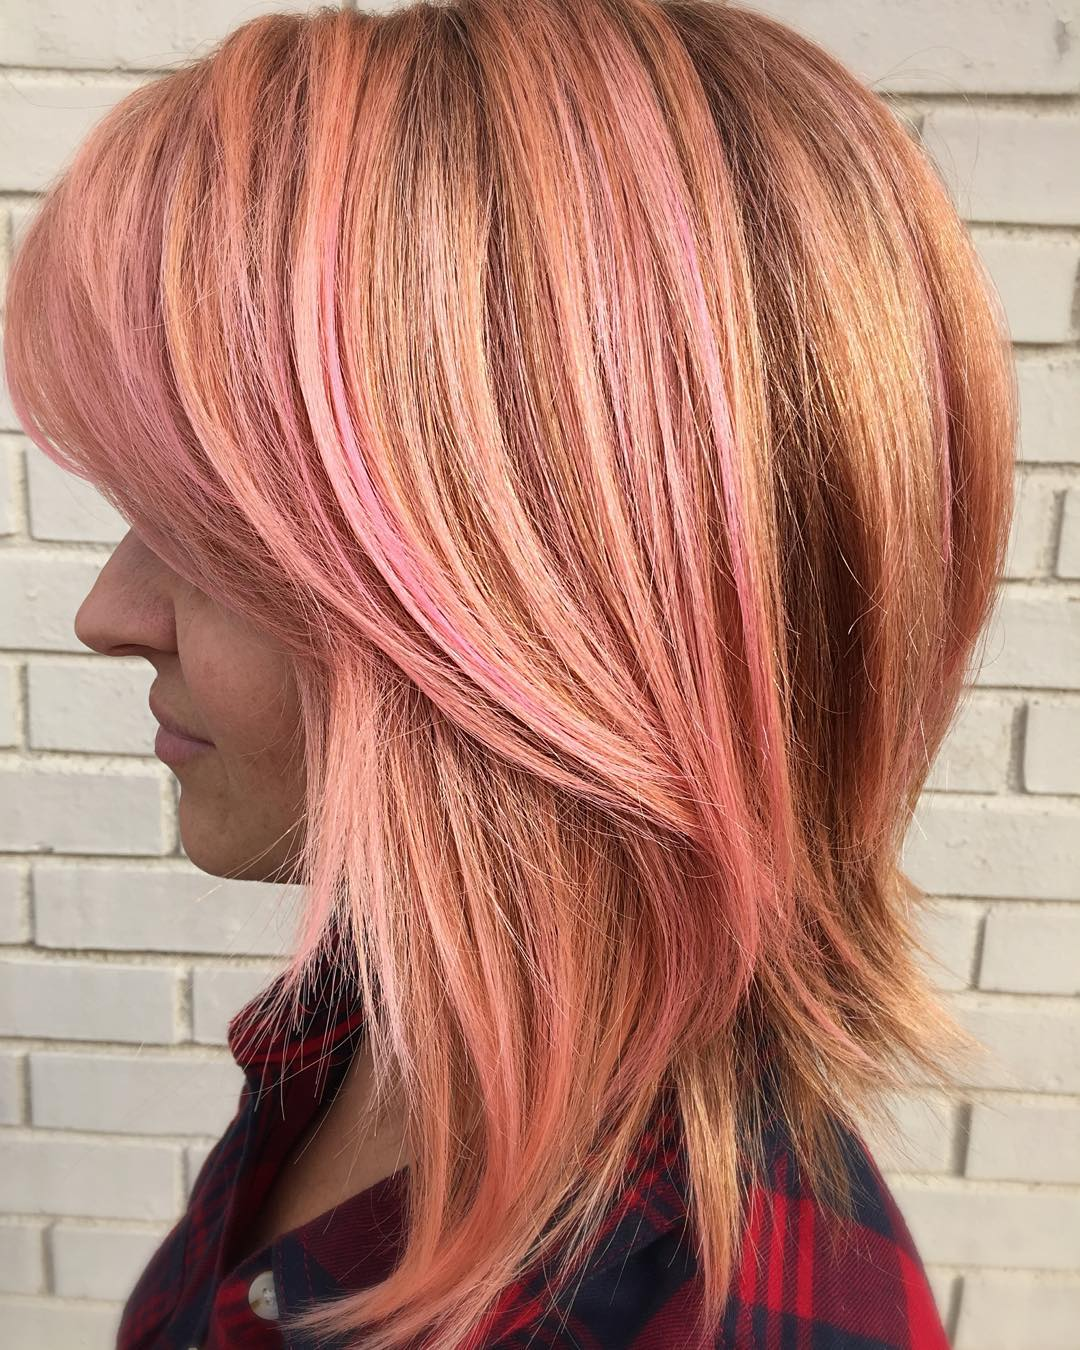 rose golden hair style